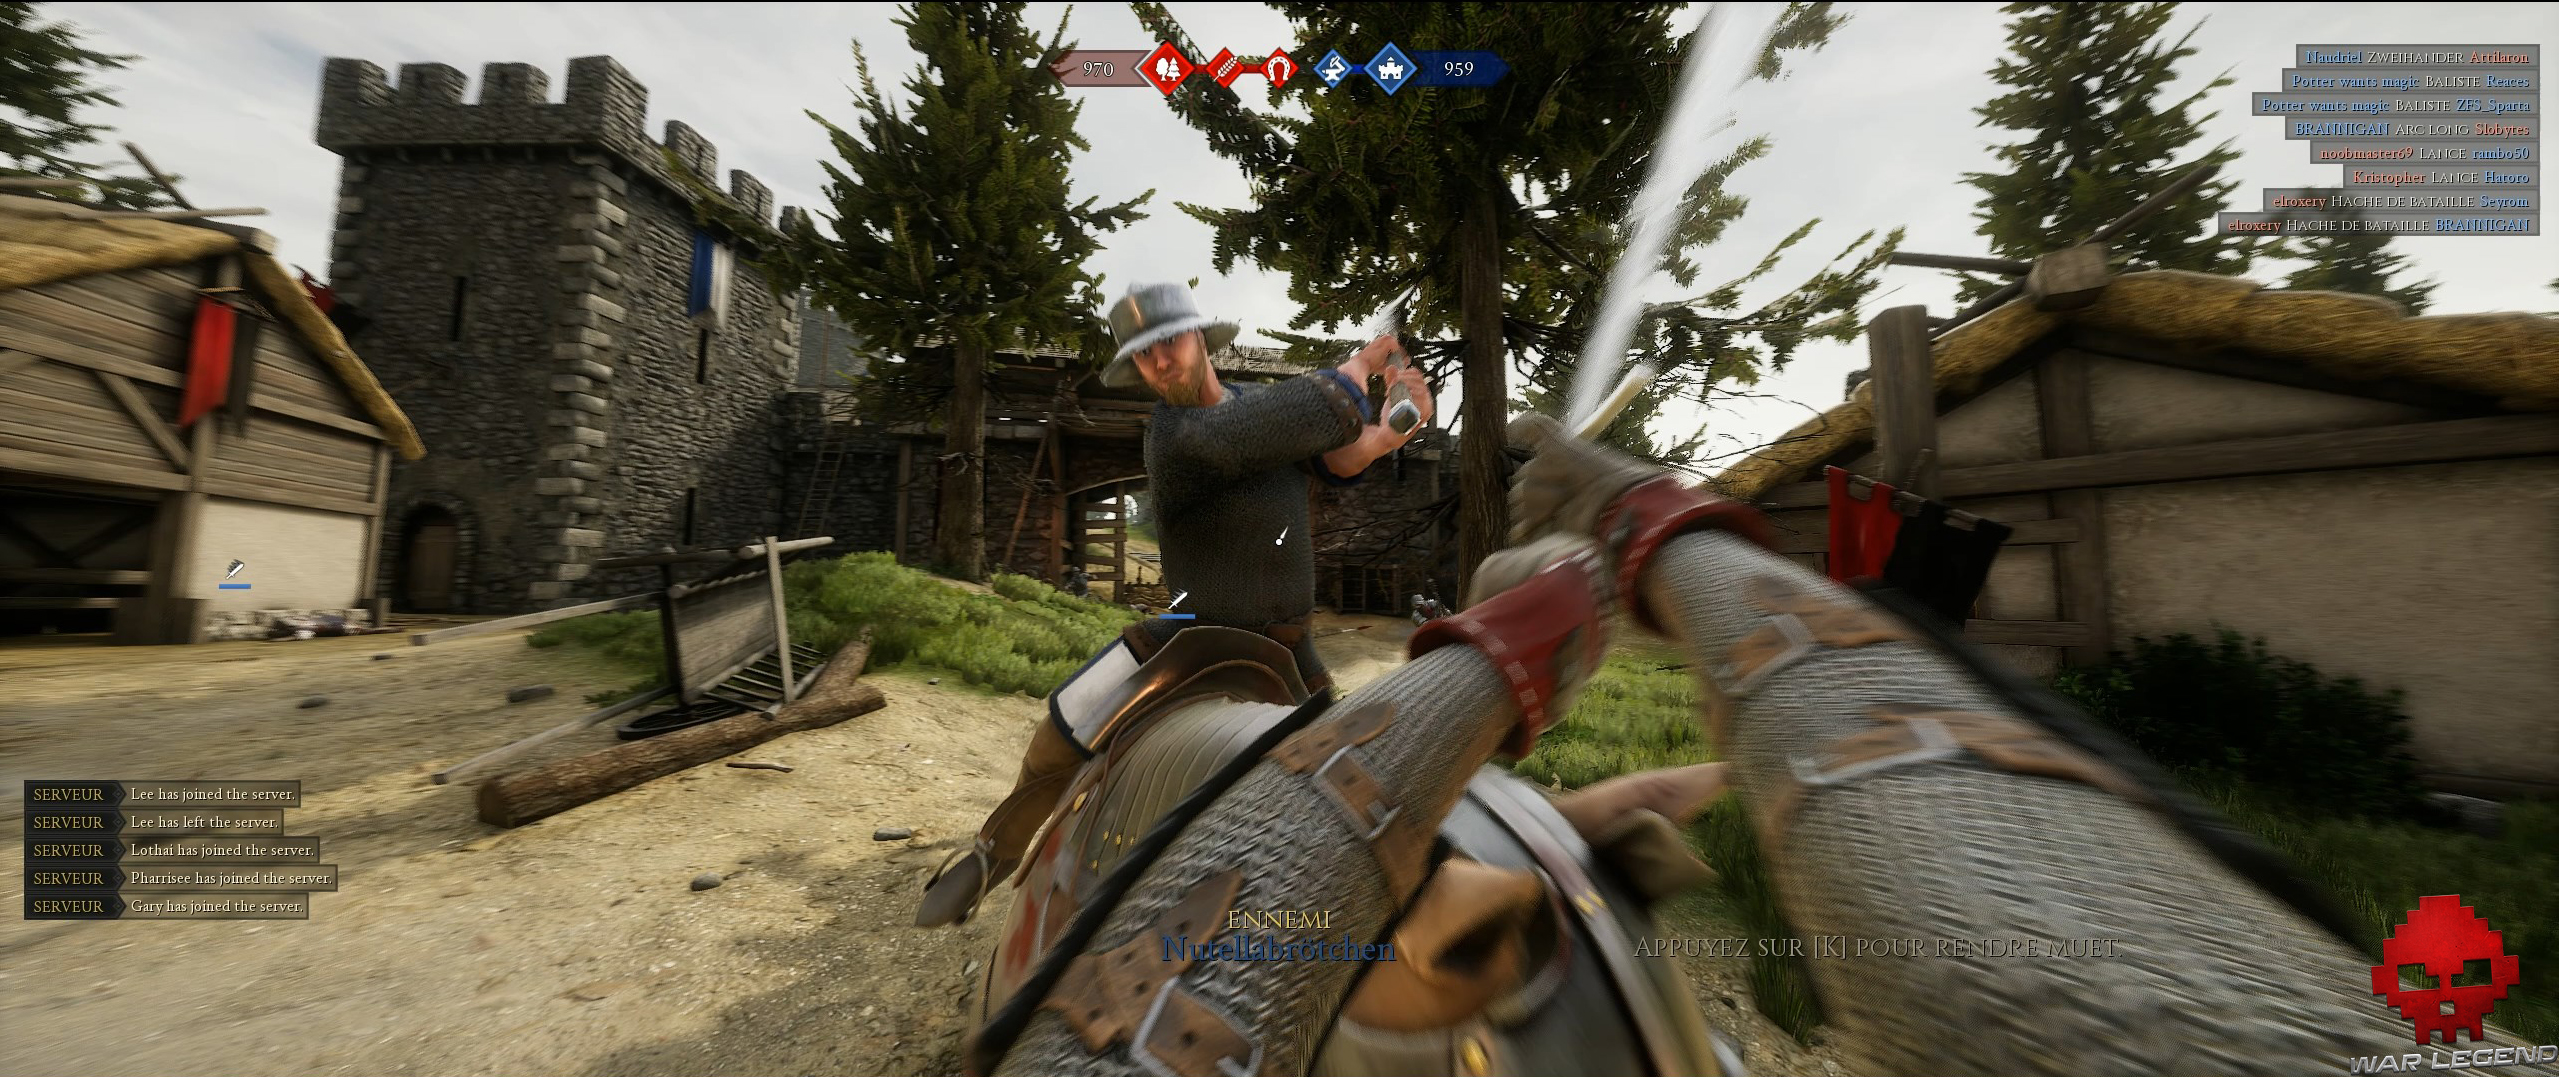 Guide épée mordhau